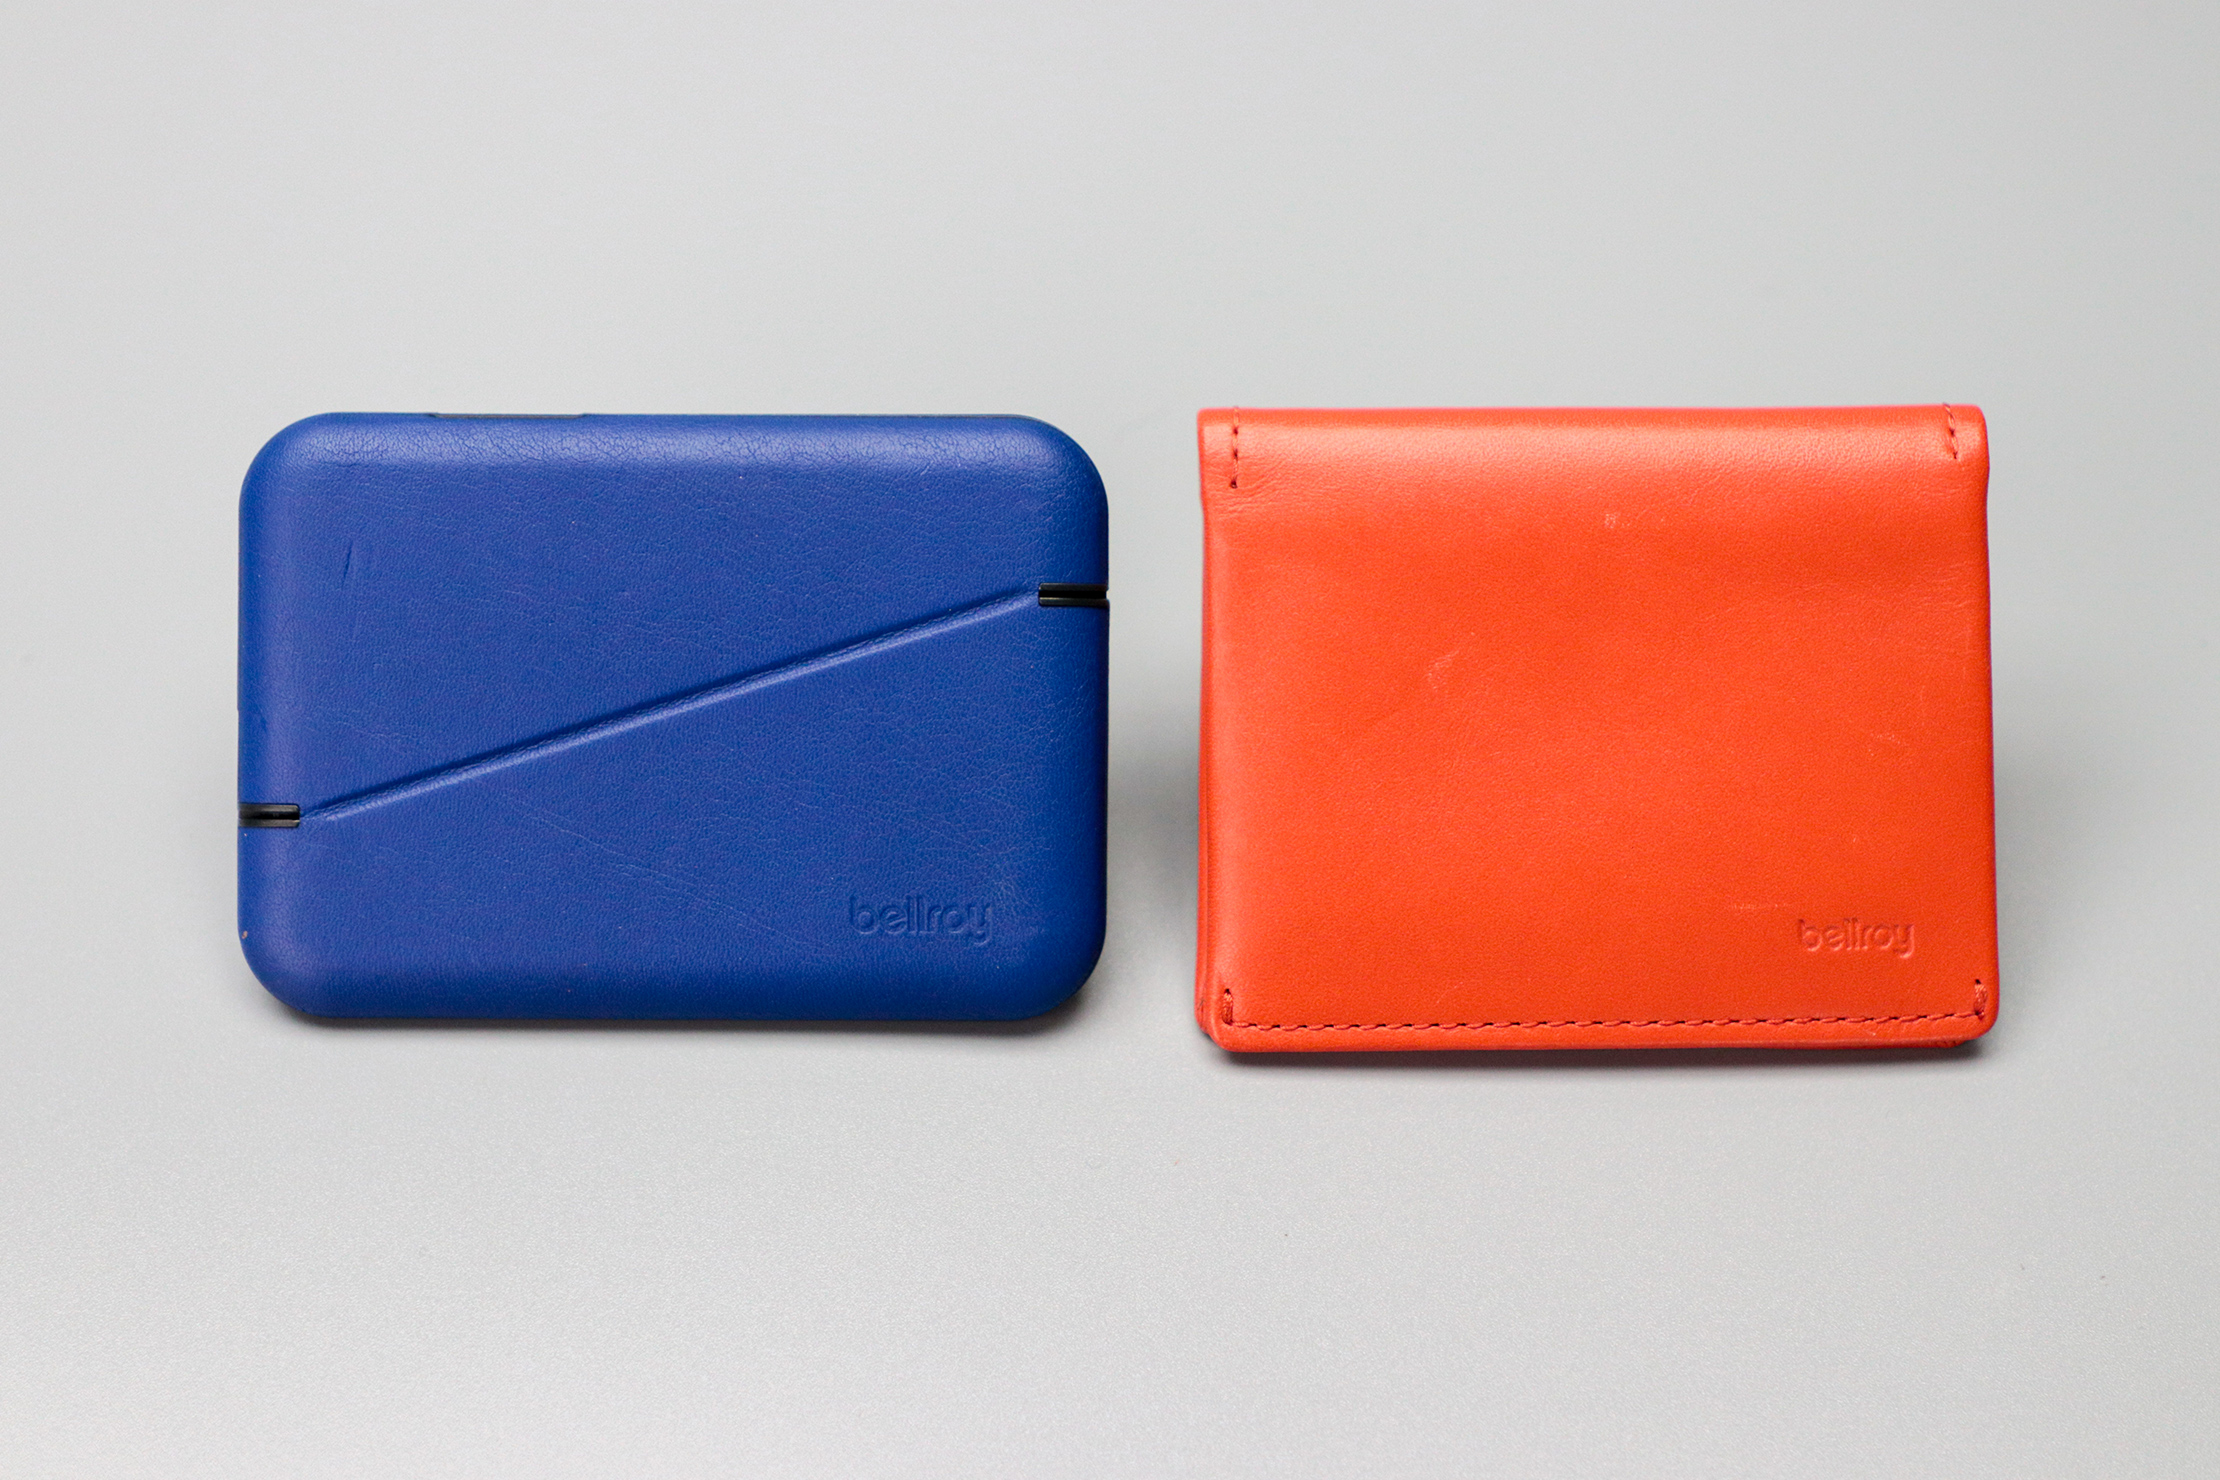 Bellroy Flip Case with Wallet